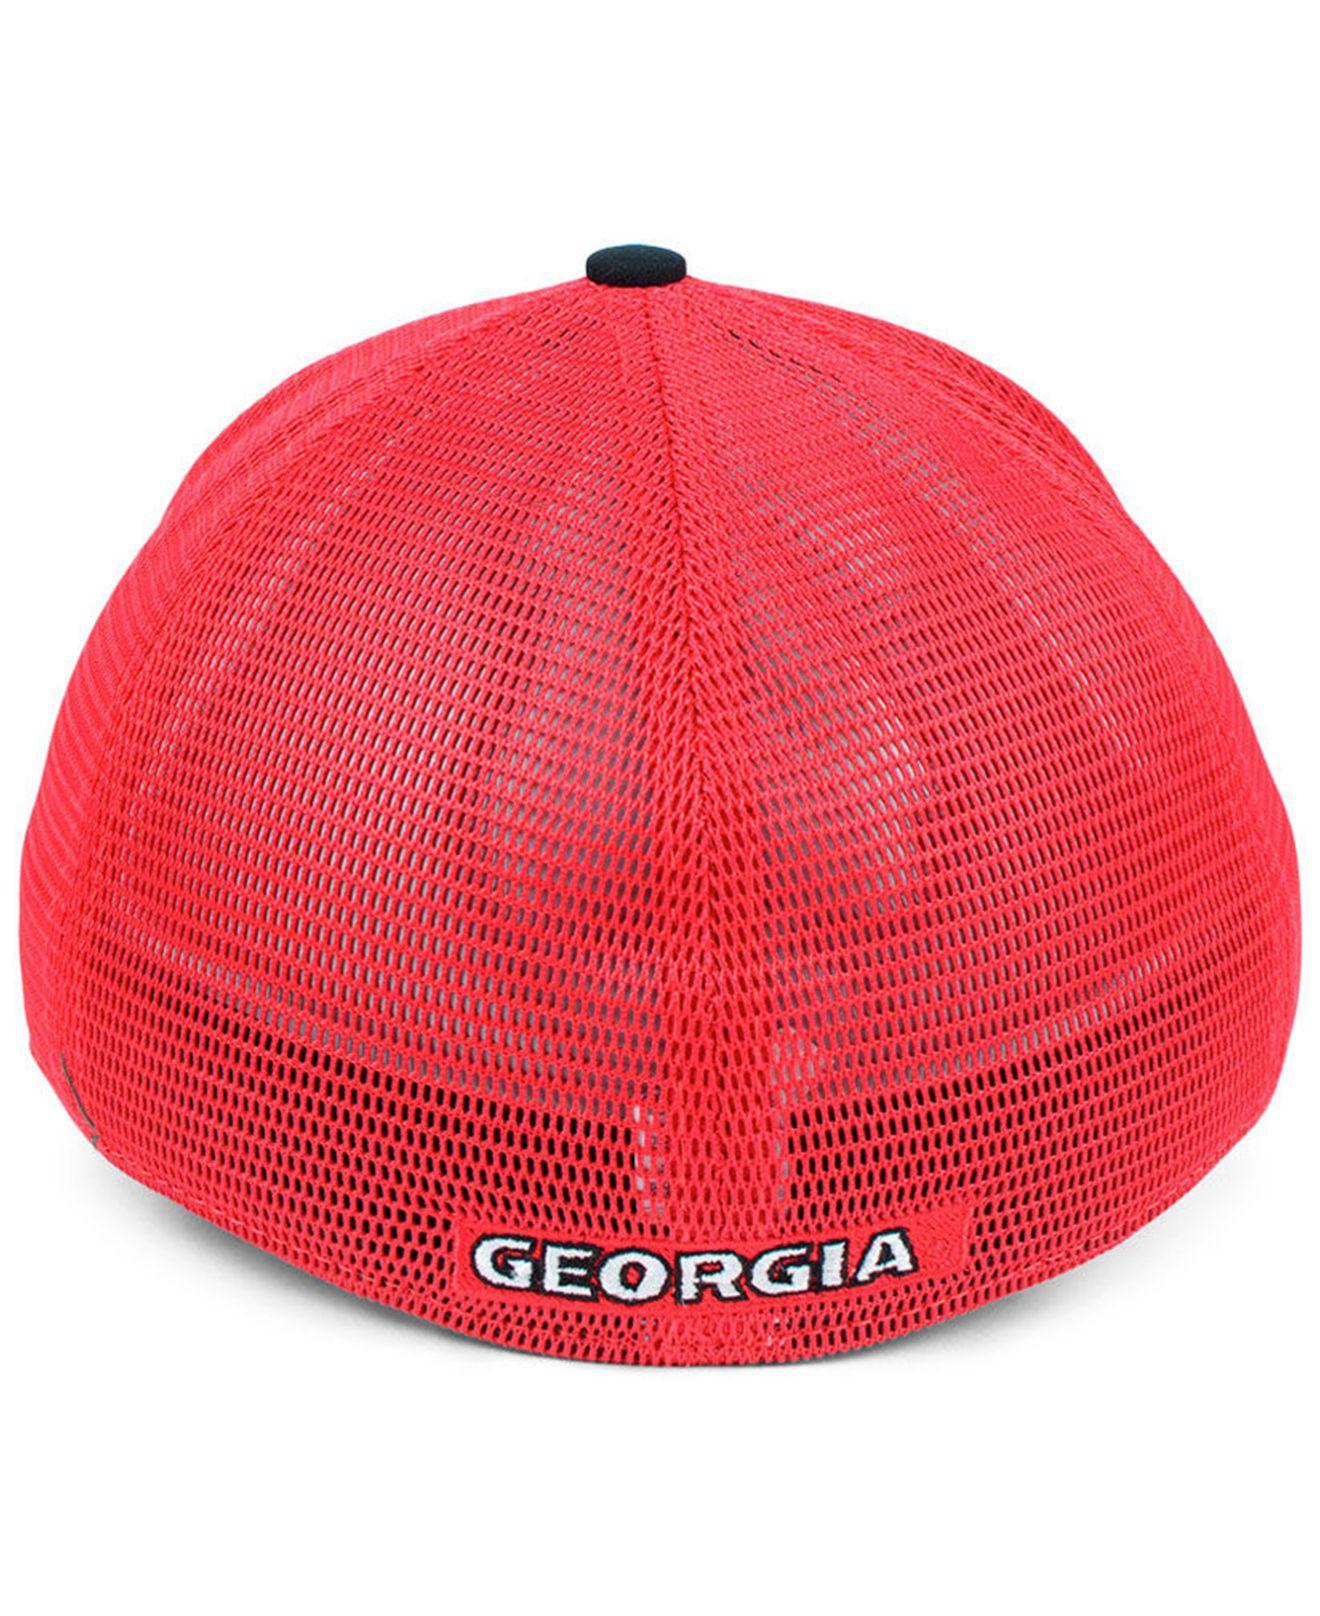 finest selection 70a70 6d2a6 Nike - Red Georgia Bulldogs Col Aro Swooshflex Cap for Men - Lyst. View  fullscreen